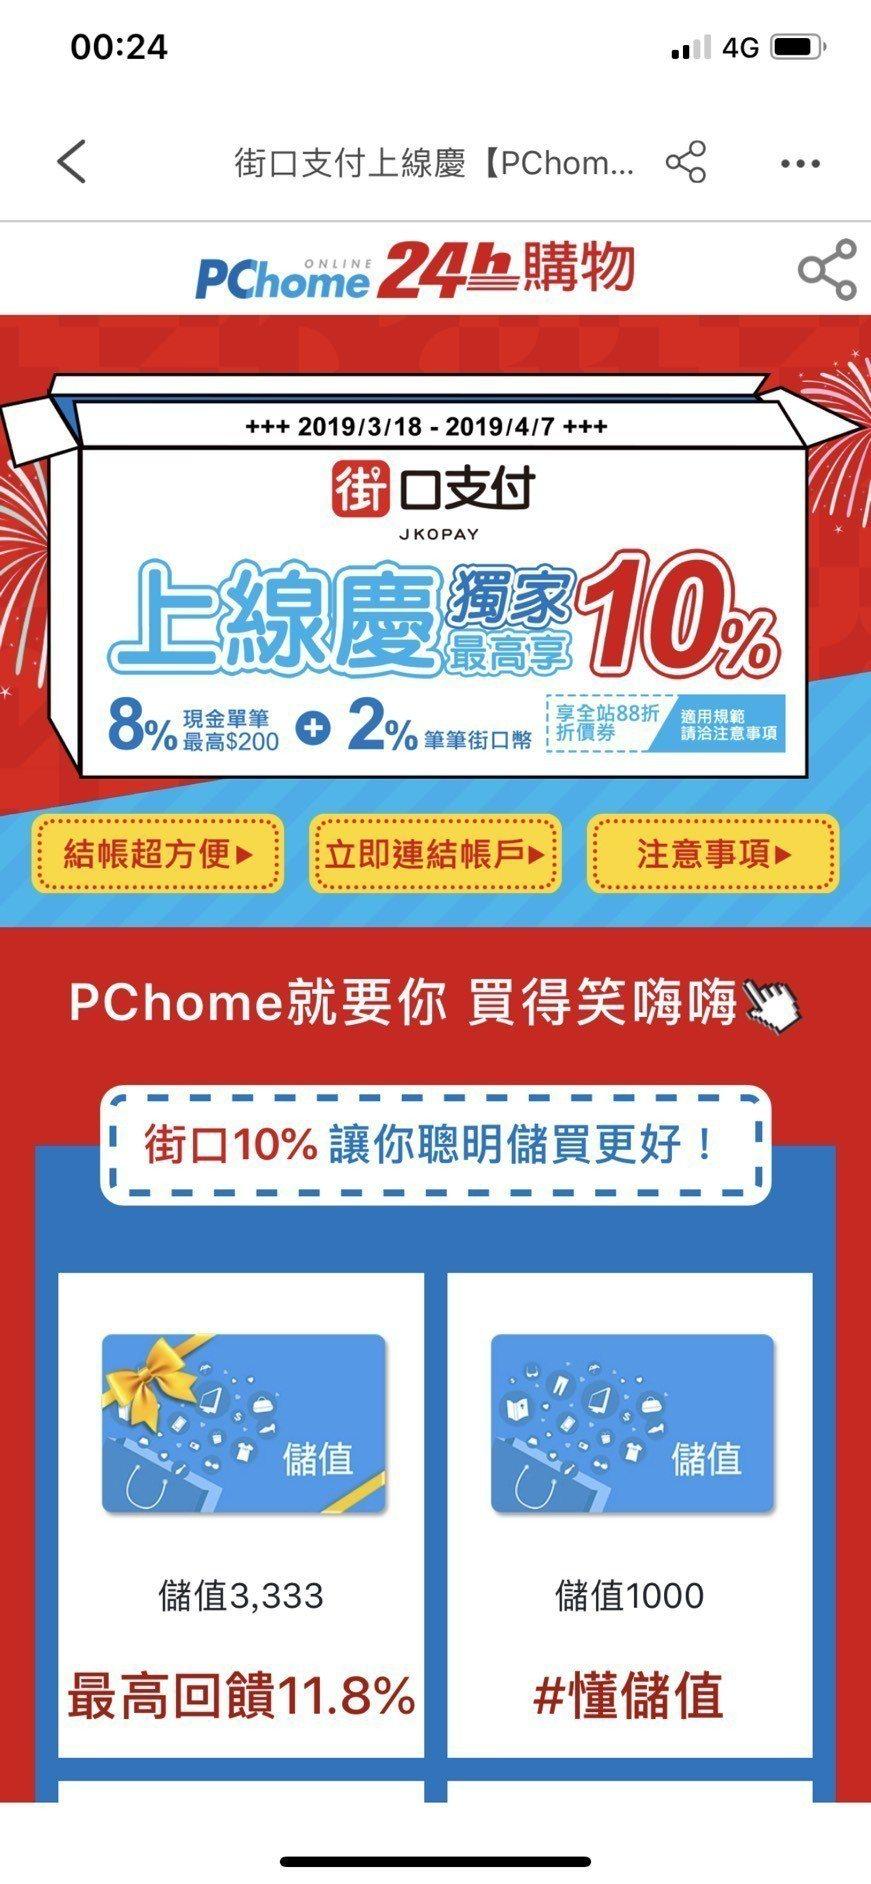 PChome 24h購物即日起至4月7日,盛大祭出「8%現金回饋週週享(單筆回饋...